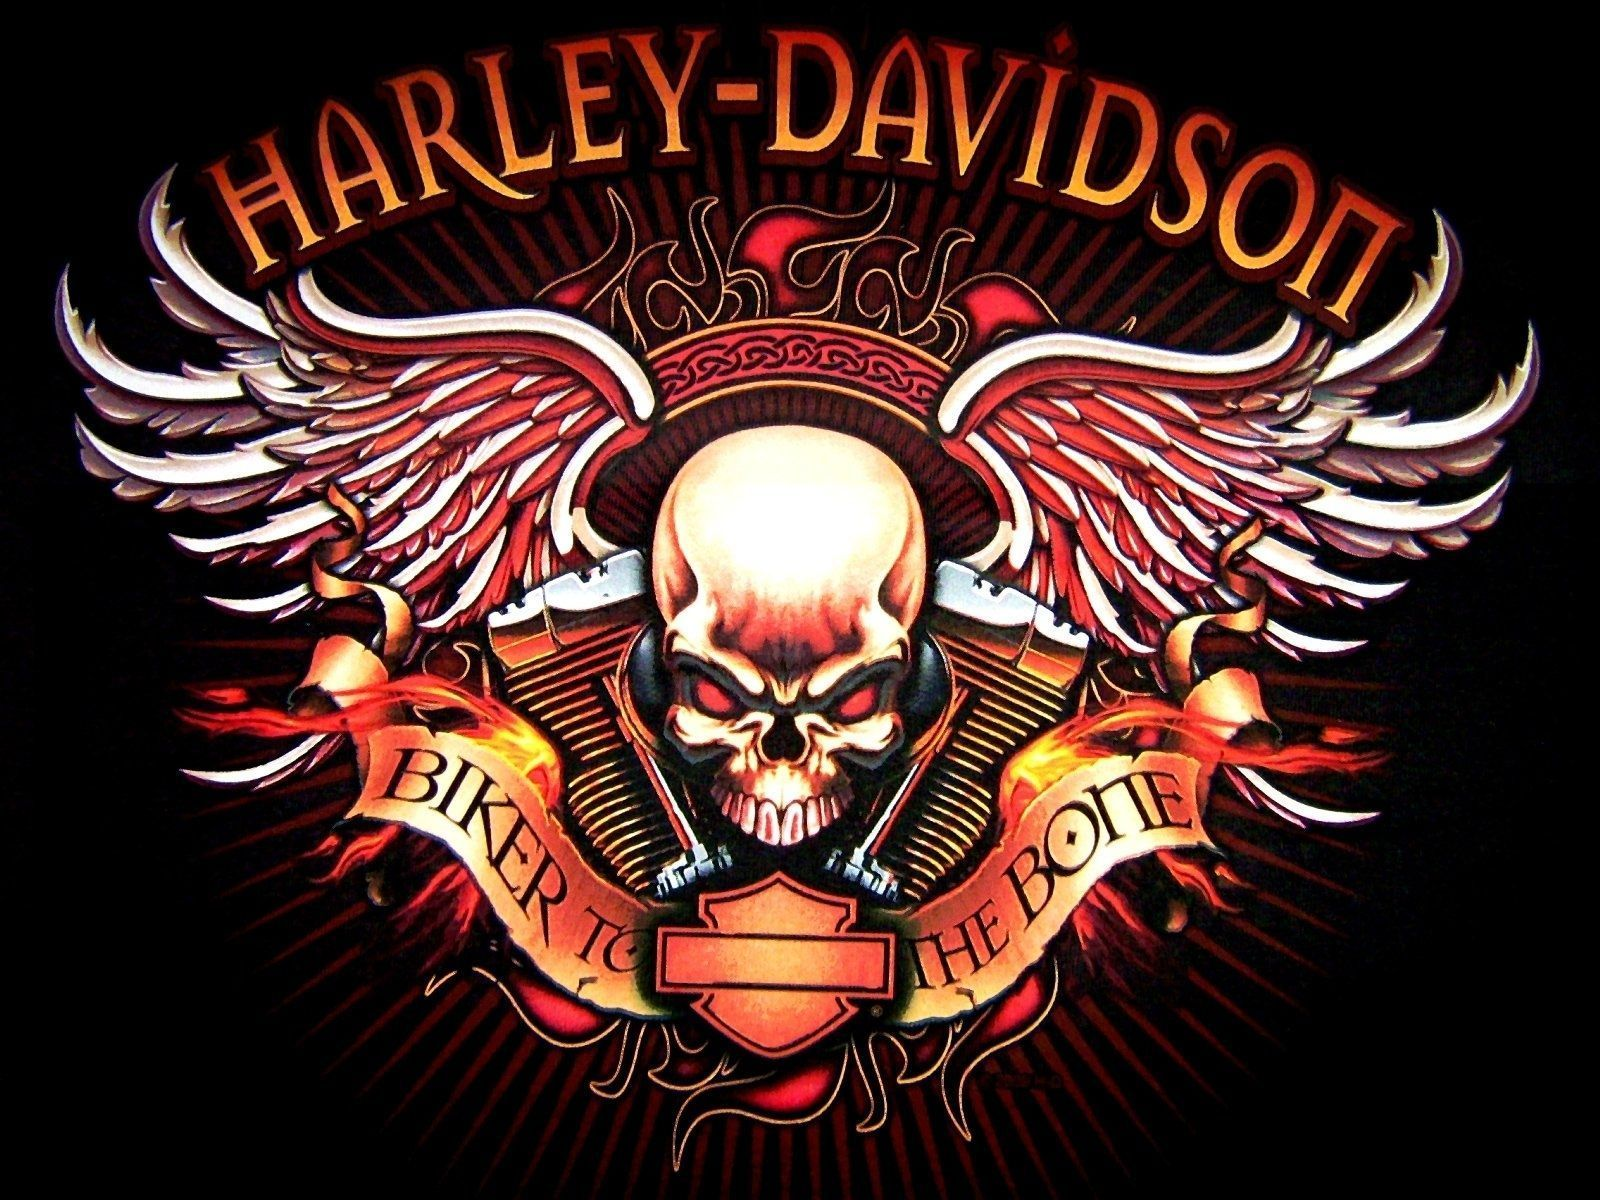 10 Beliebtesten Harley Davidson Desktop Hintergrund Full Hd 1080p Fur Pc Desktop 2 1080p Beliebtesten Davidson Desktop Desktophi In 2020 Harley Davidson Wallpaper Harley Davidson Logo Harley Davidson